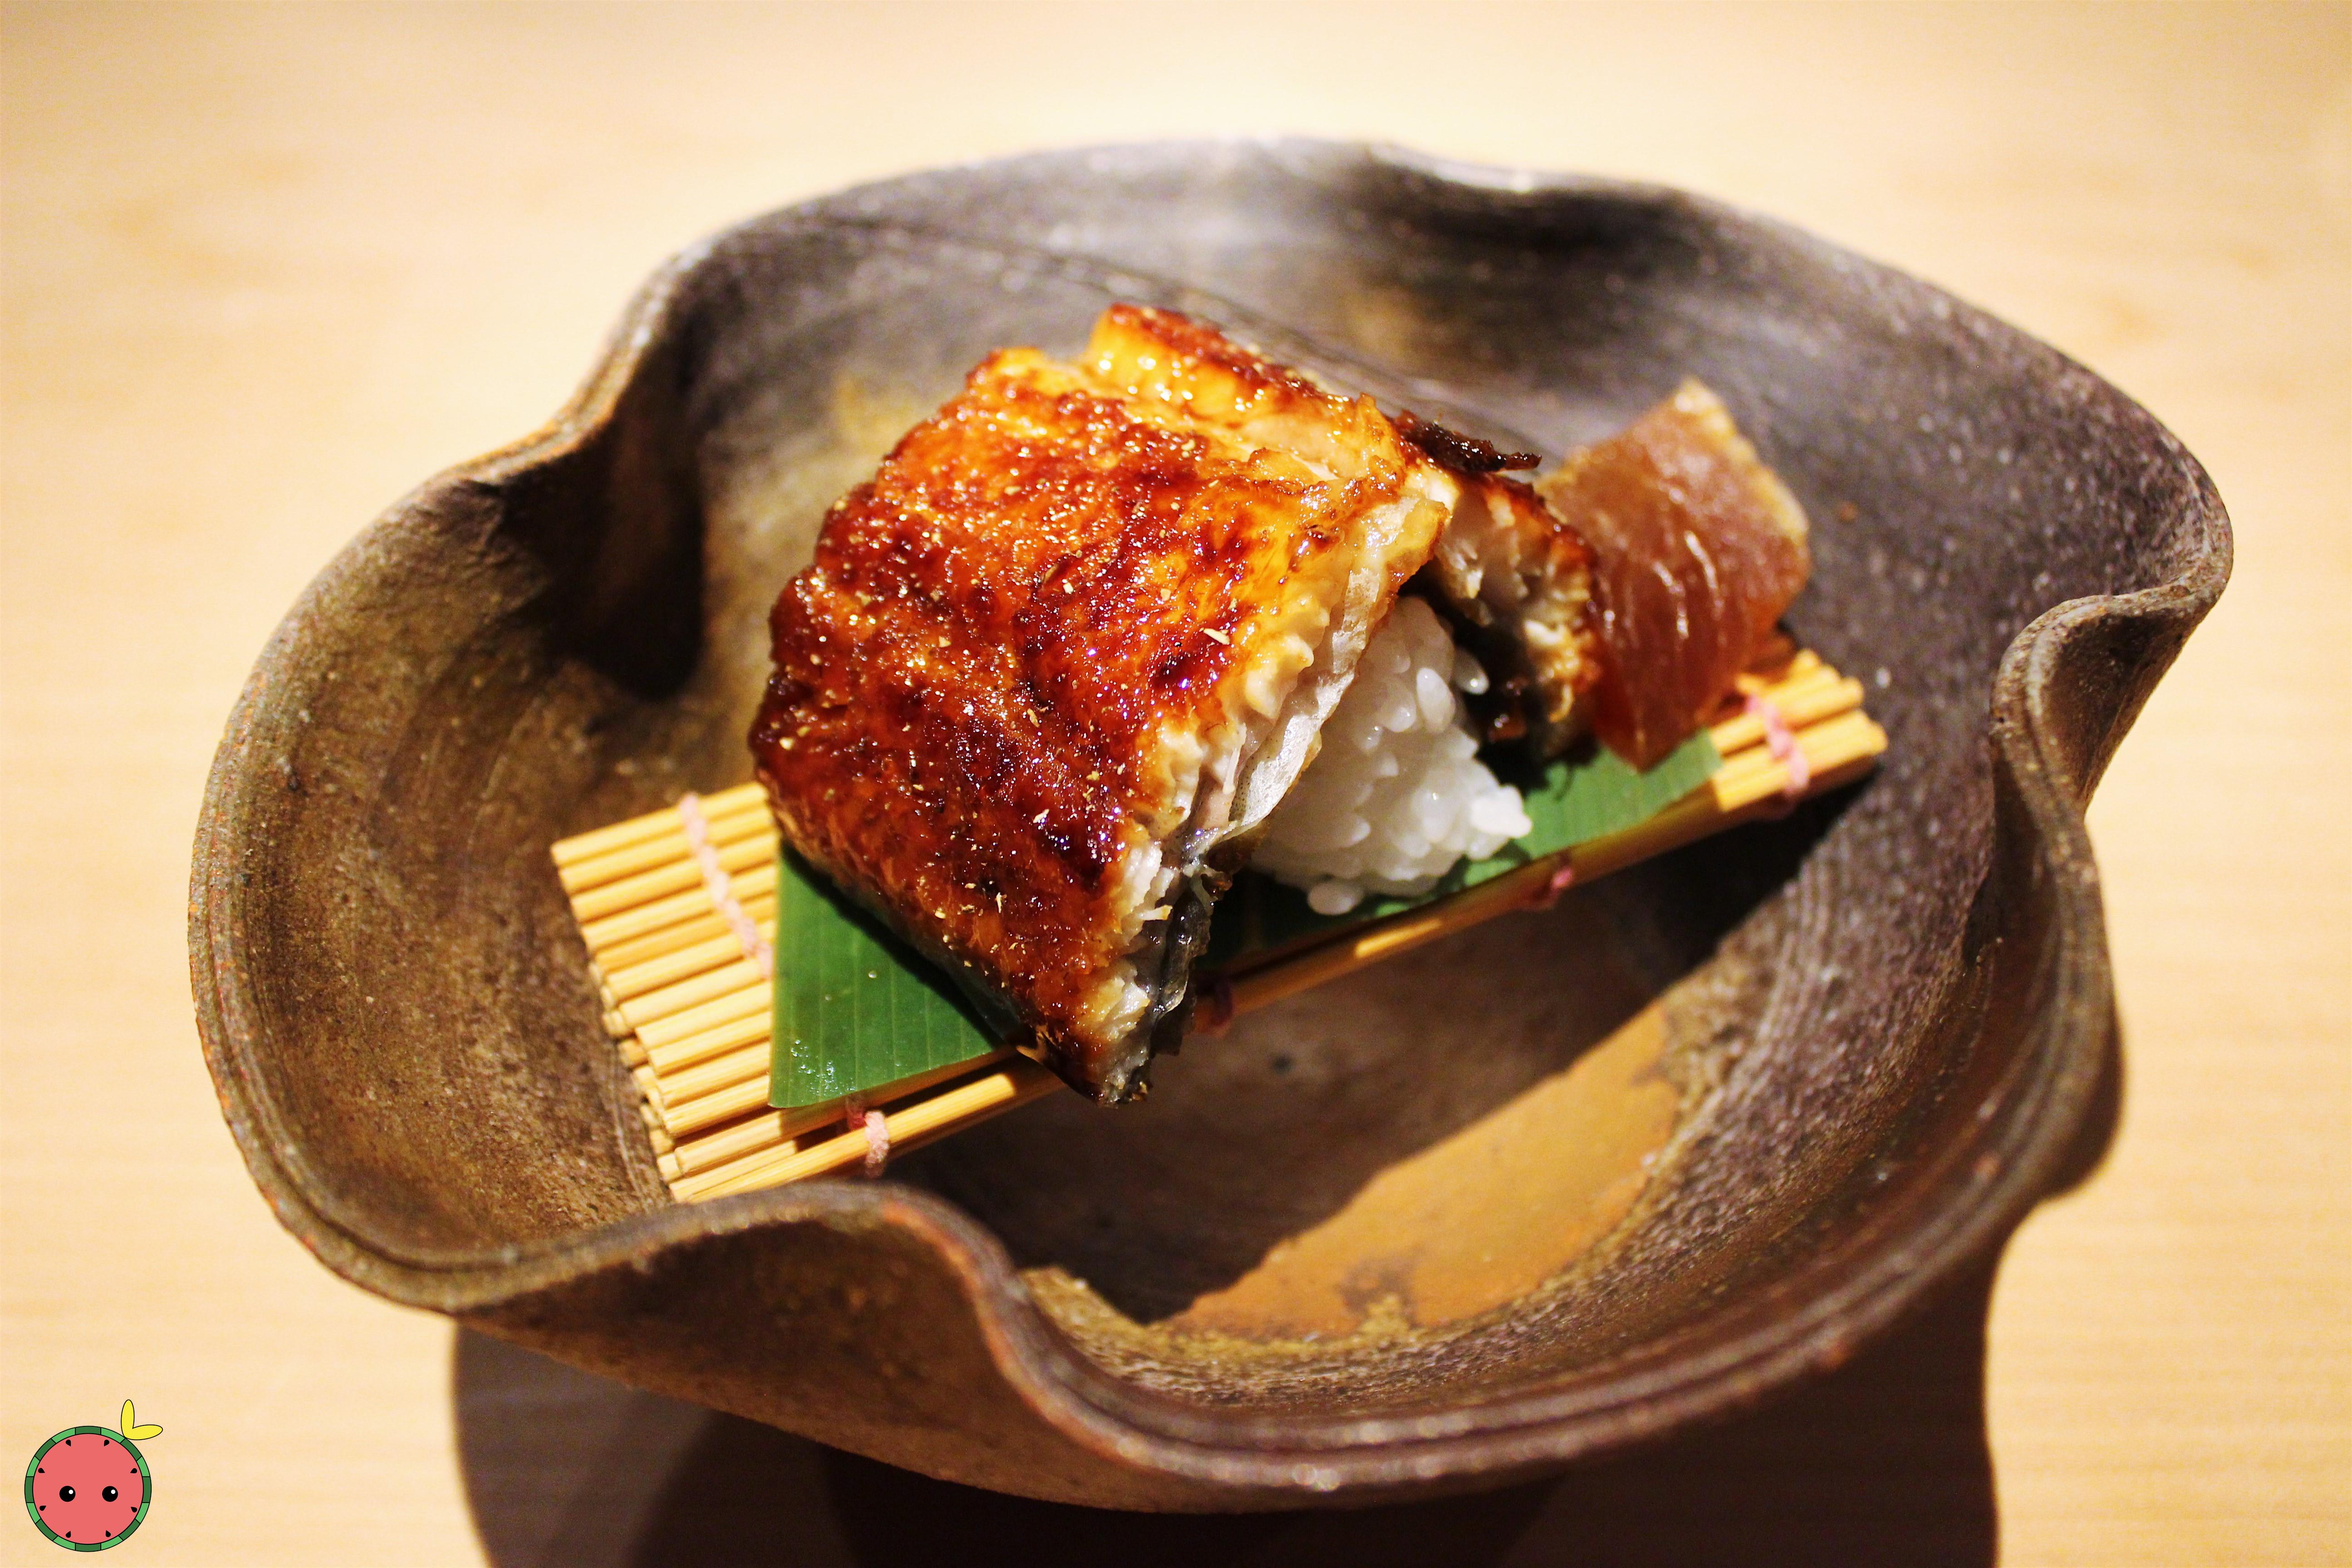 Unagi Kabayaki with Narazuke Japanese pickle marinaded in sake for 2 years at NAOE